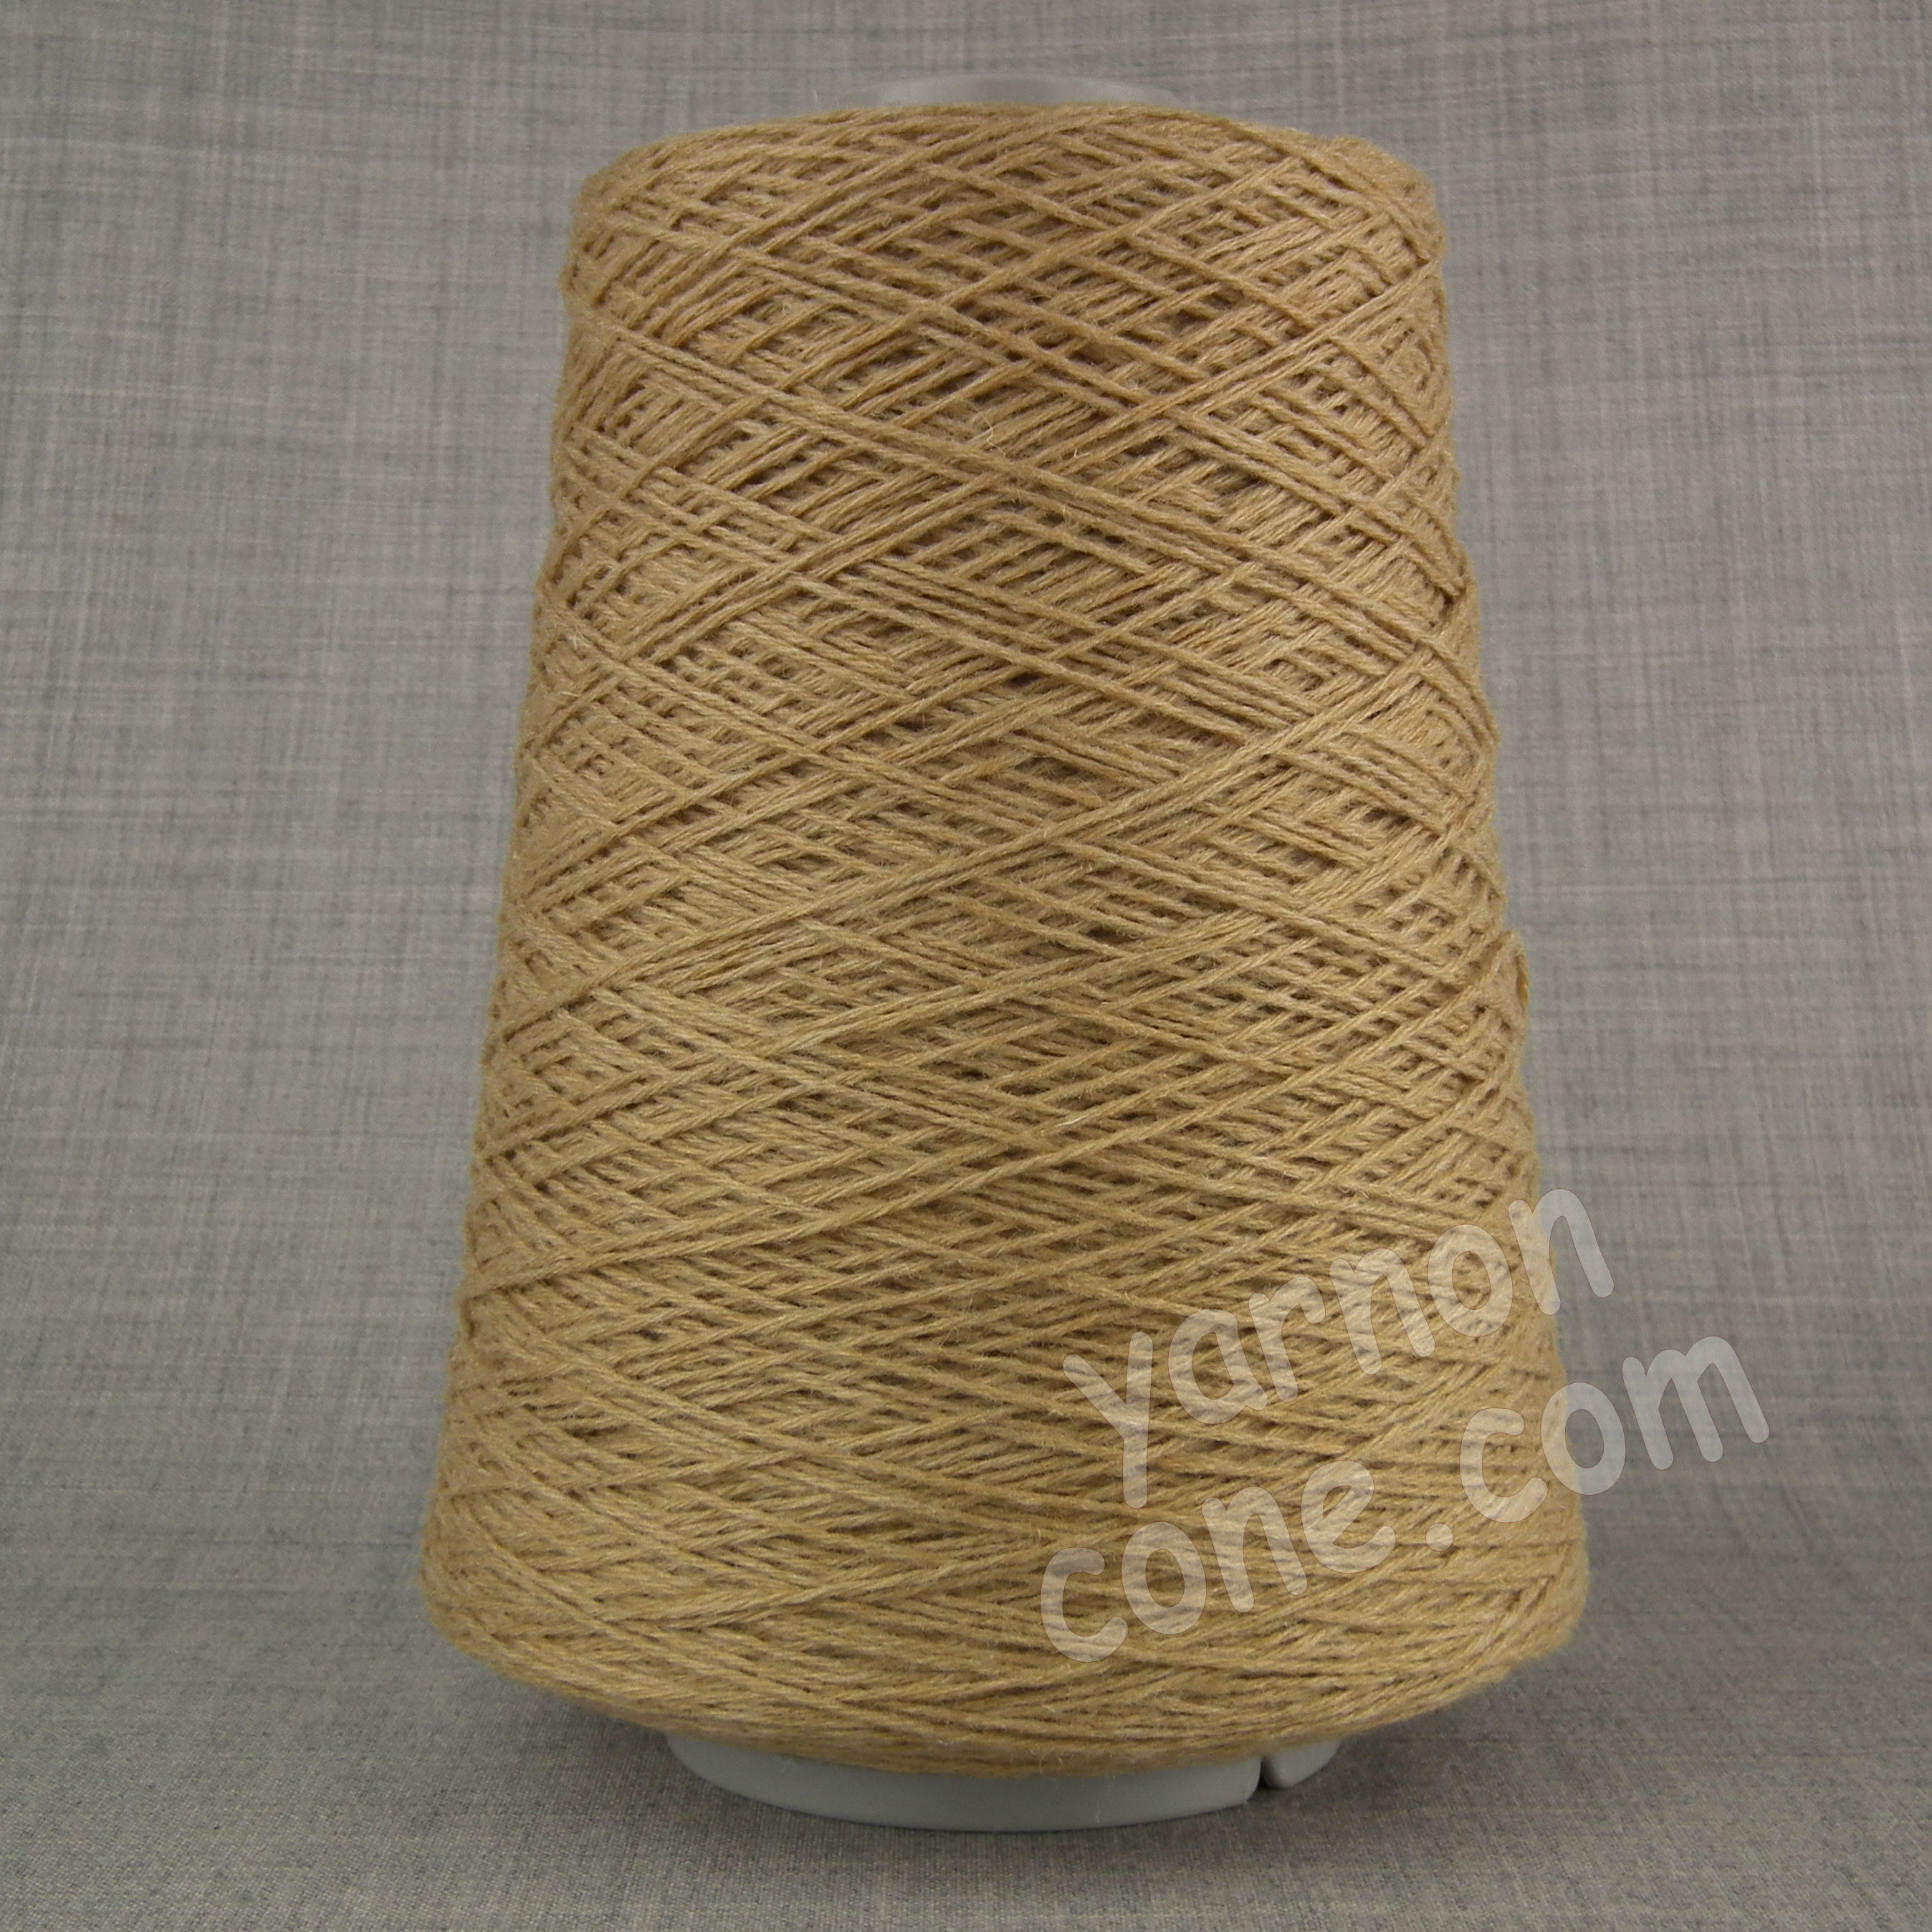 cashmere merino wool soft yarn on cone knitting italian quality 4 ply camel brown